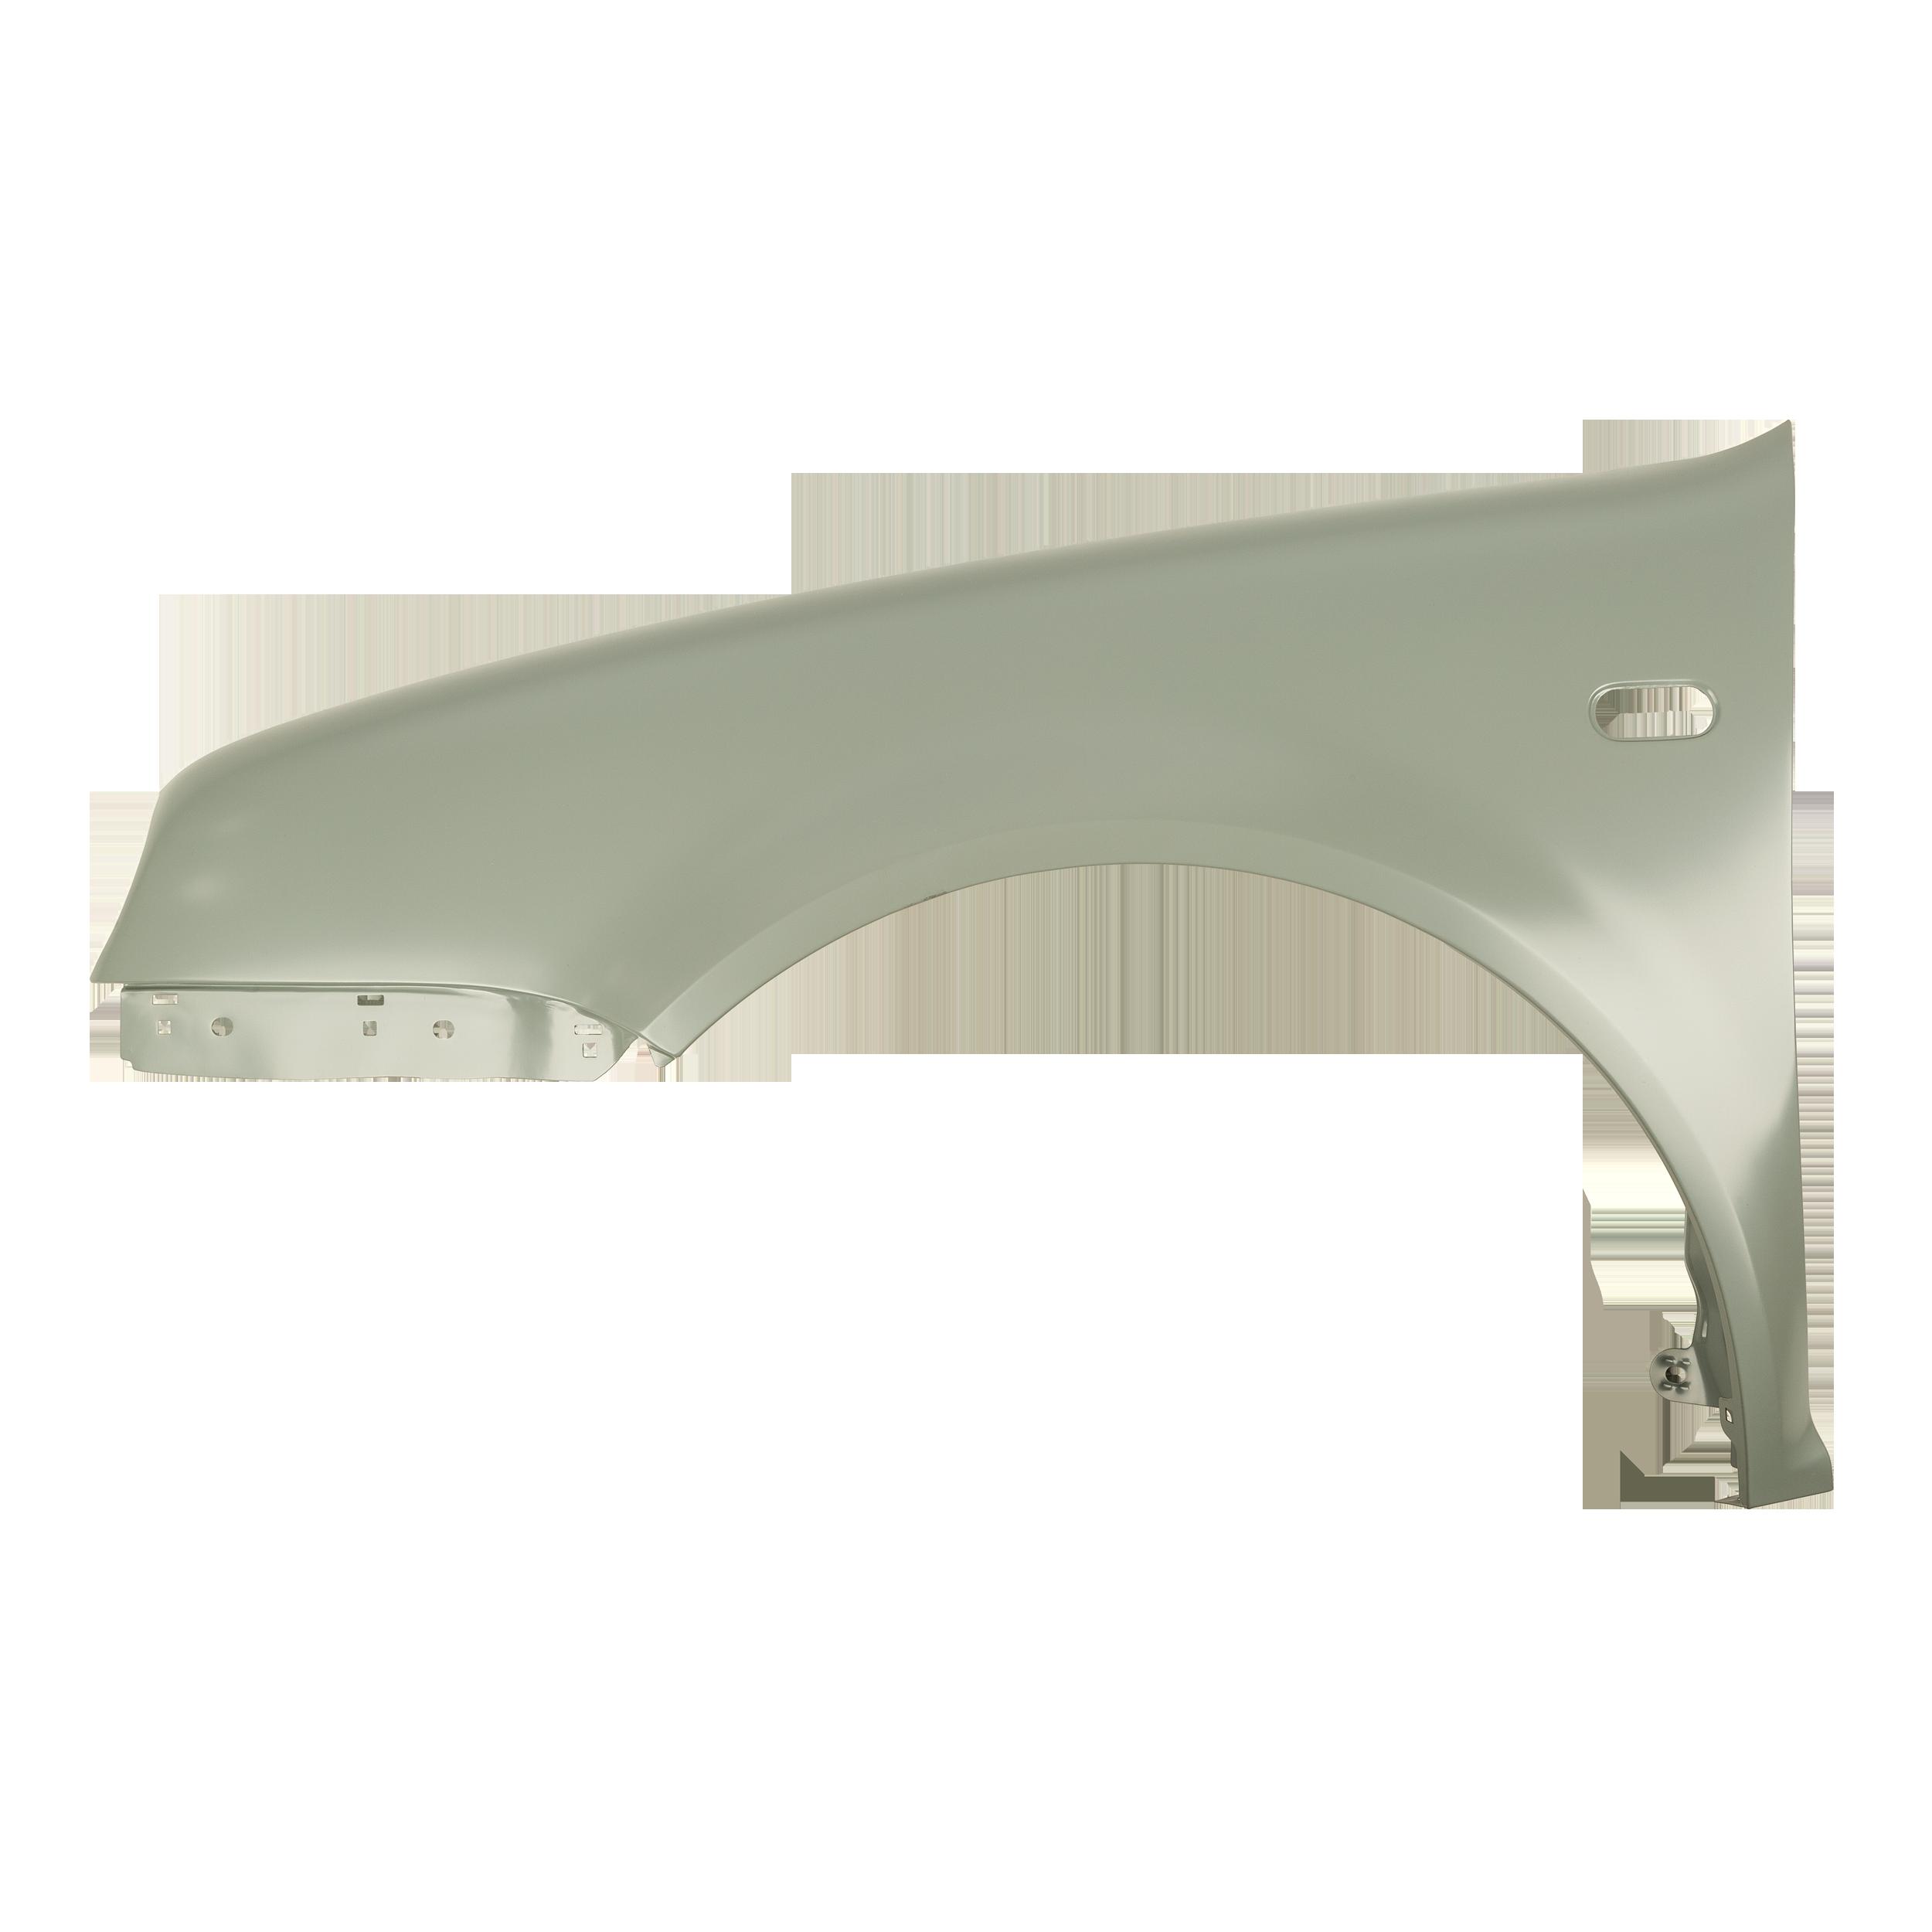 PRASCO Verbreiterung Kotflügel Premium OP0301584 für OPEL Certified hinten links